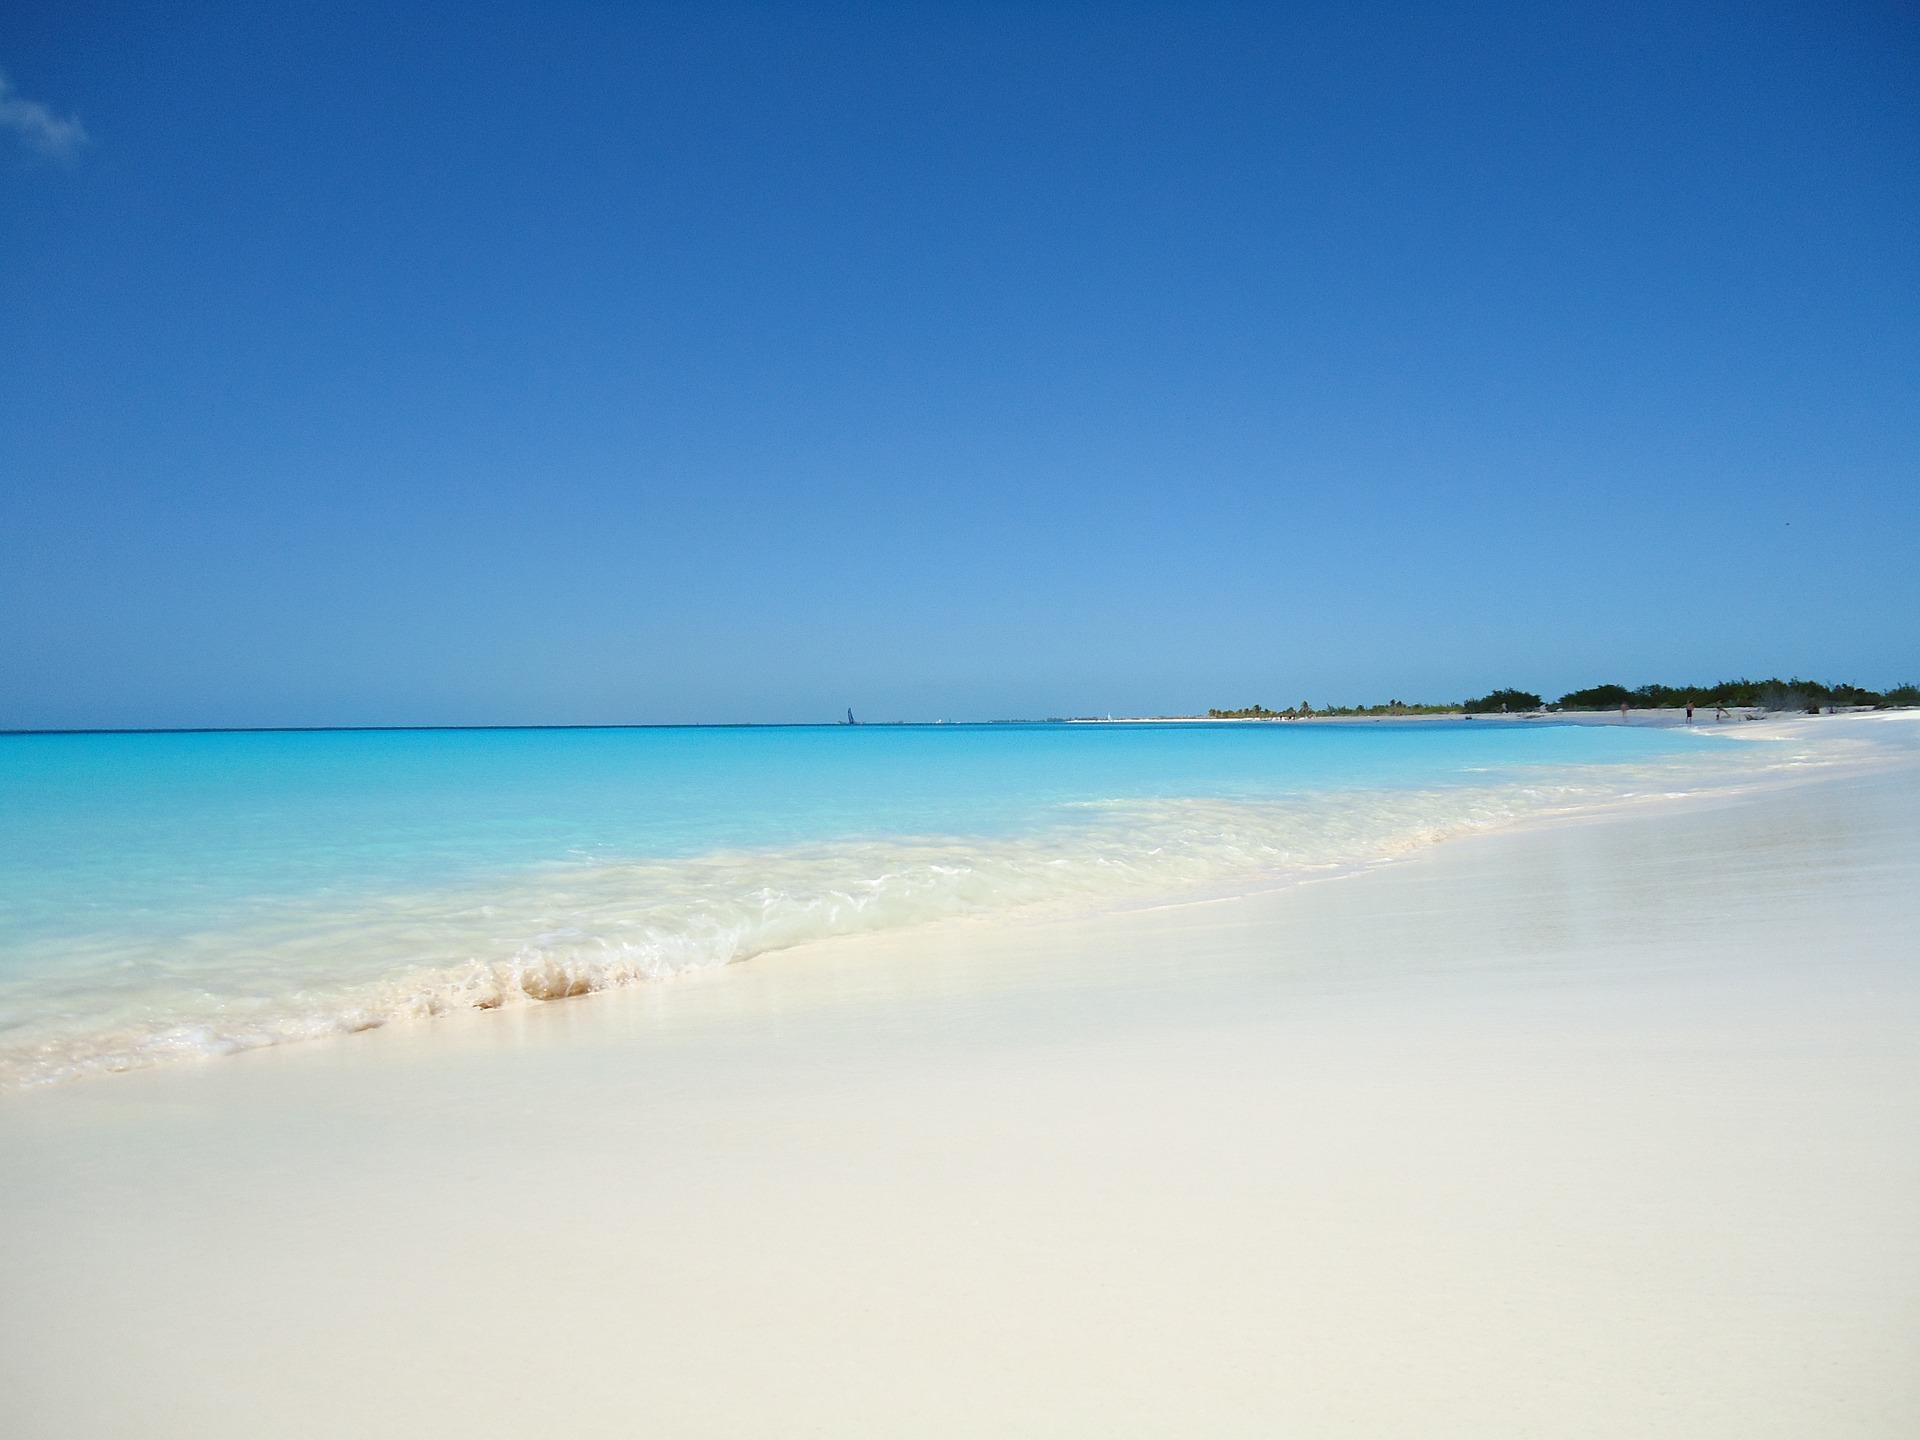 beach in cuba hurricane irma